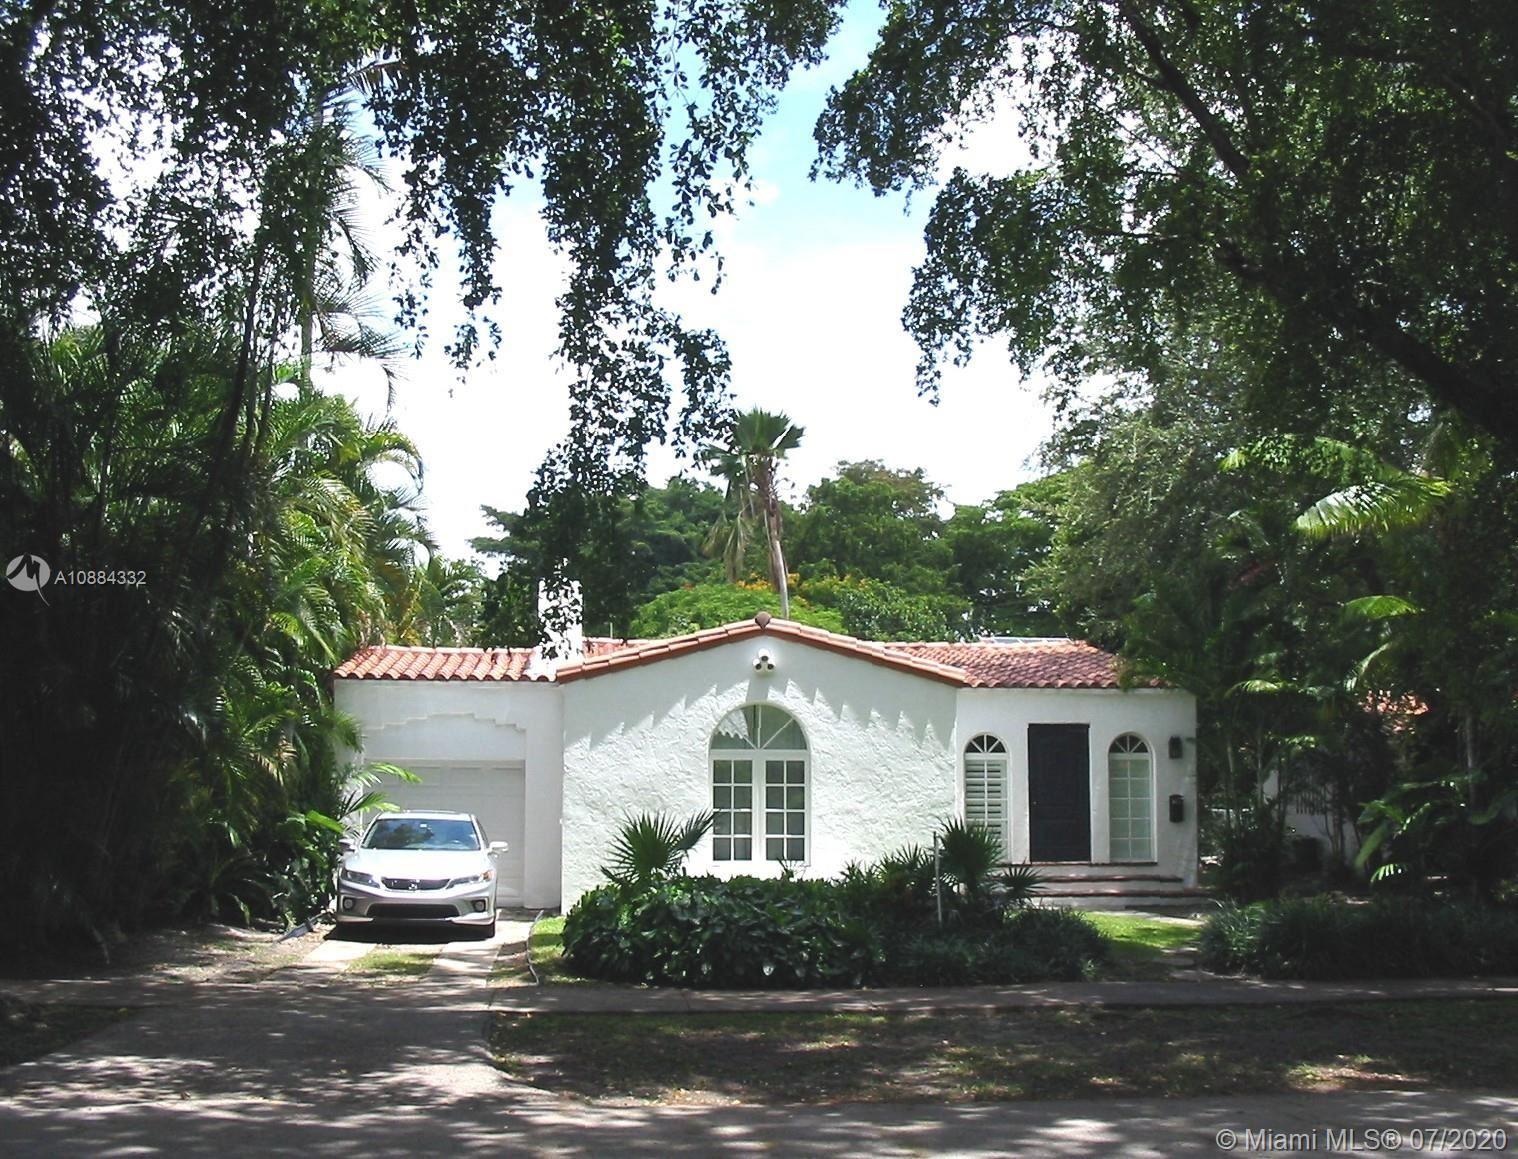 311 Aledo Ave, Coral Gables, FL 33134 - #: A10884332